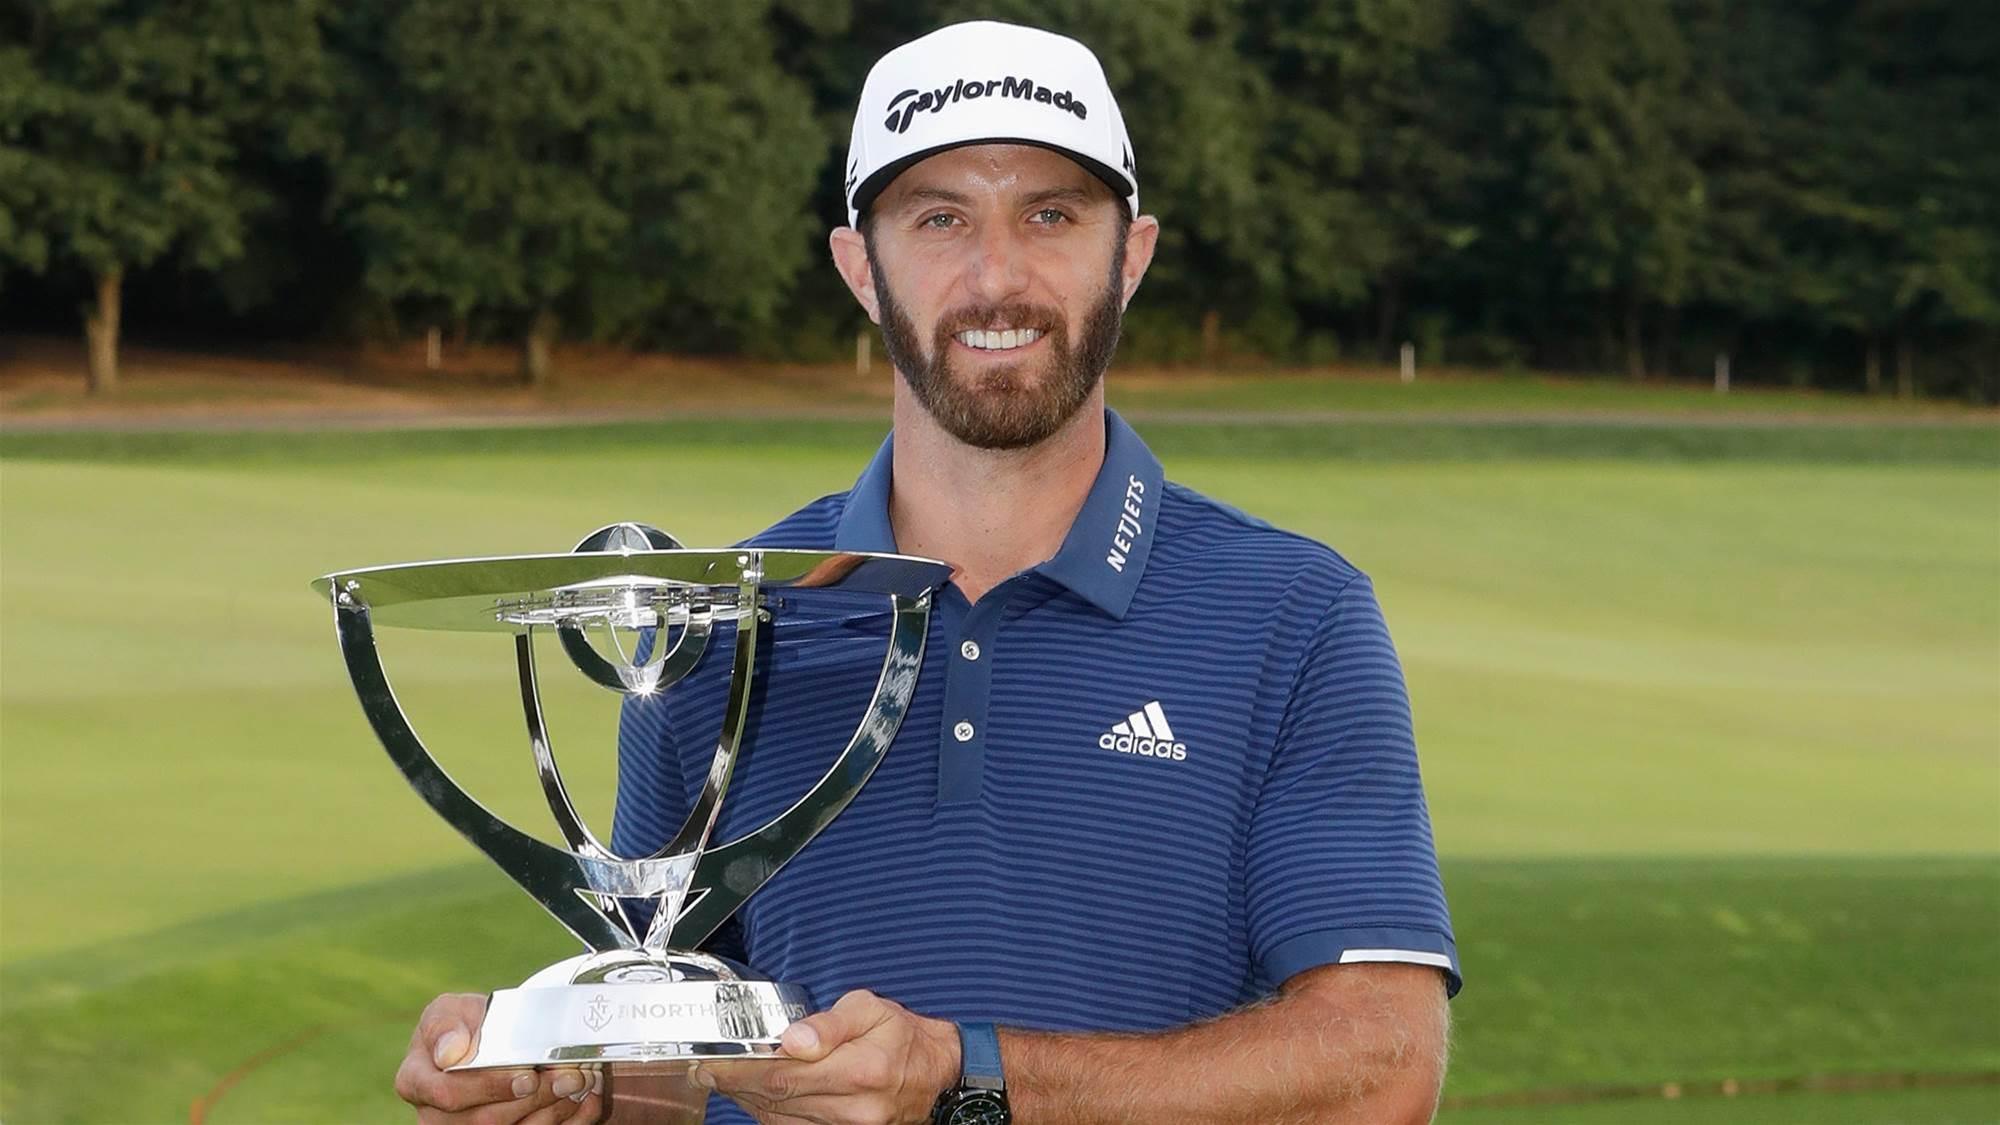 PGA TOUR: Johnson back on top